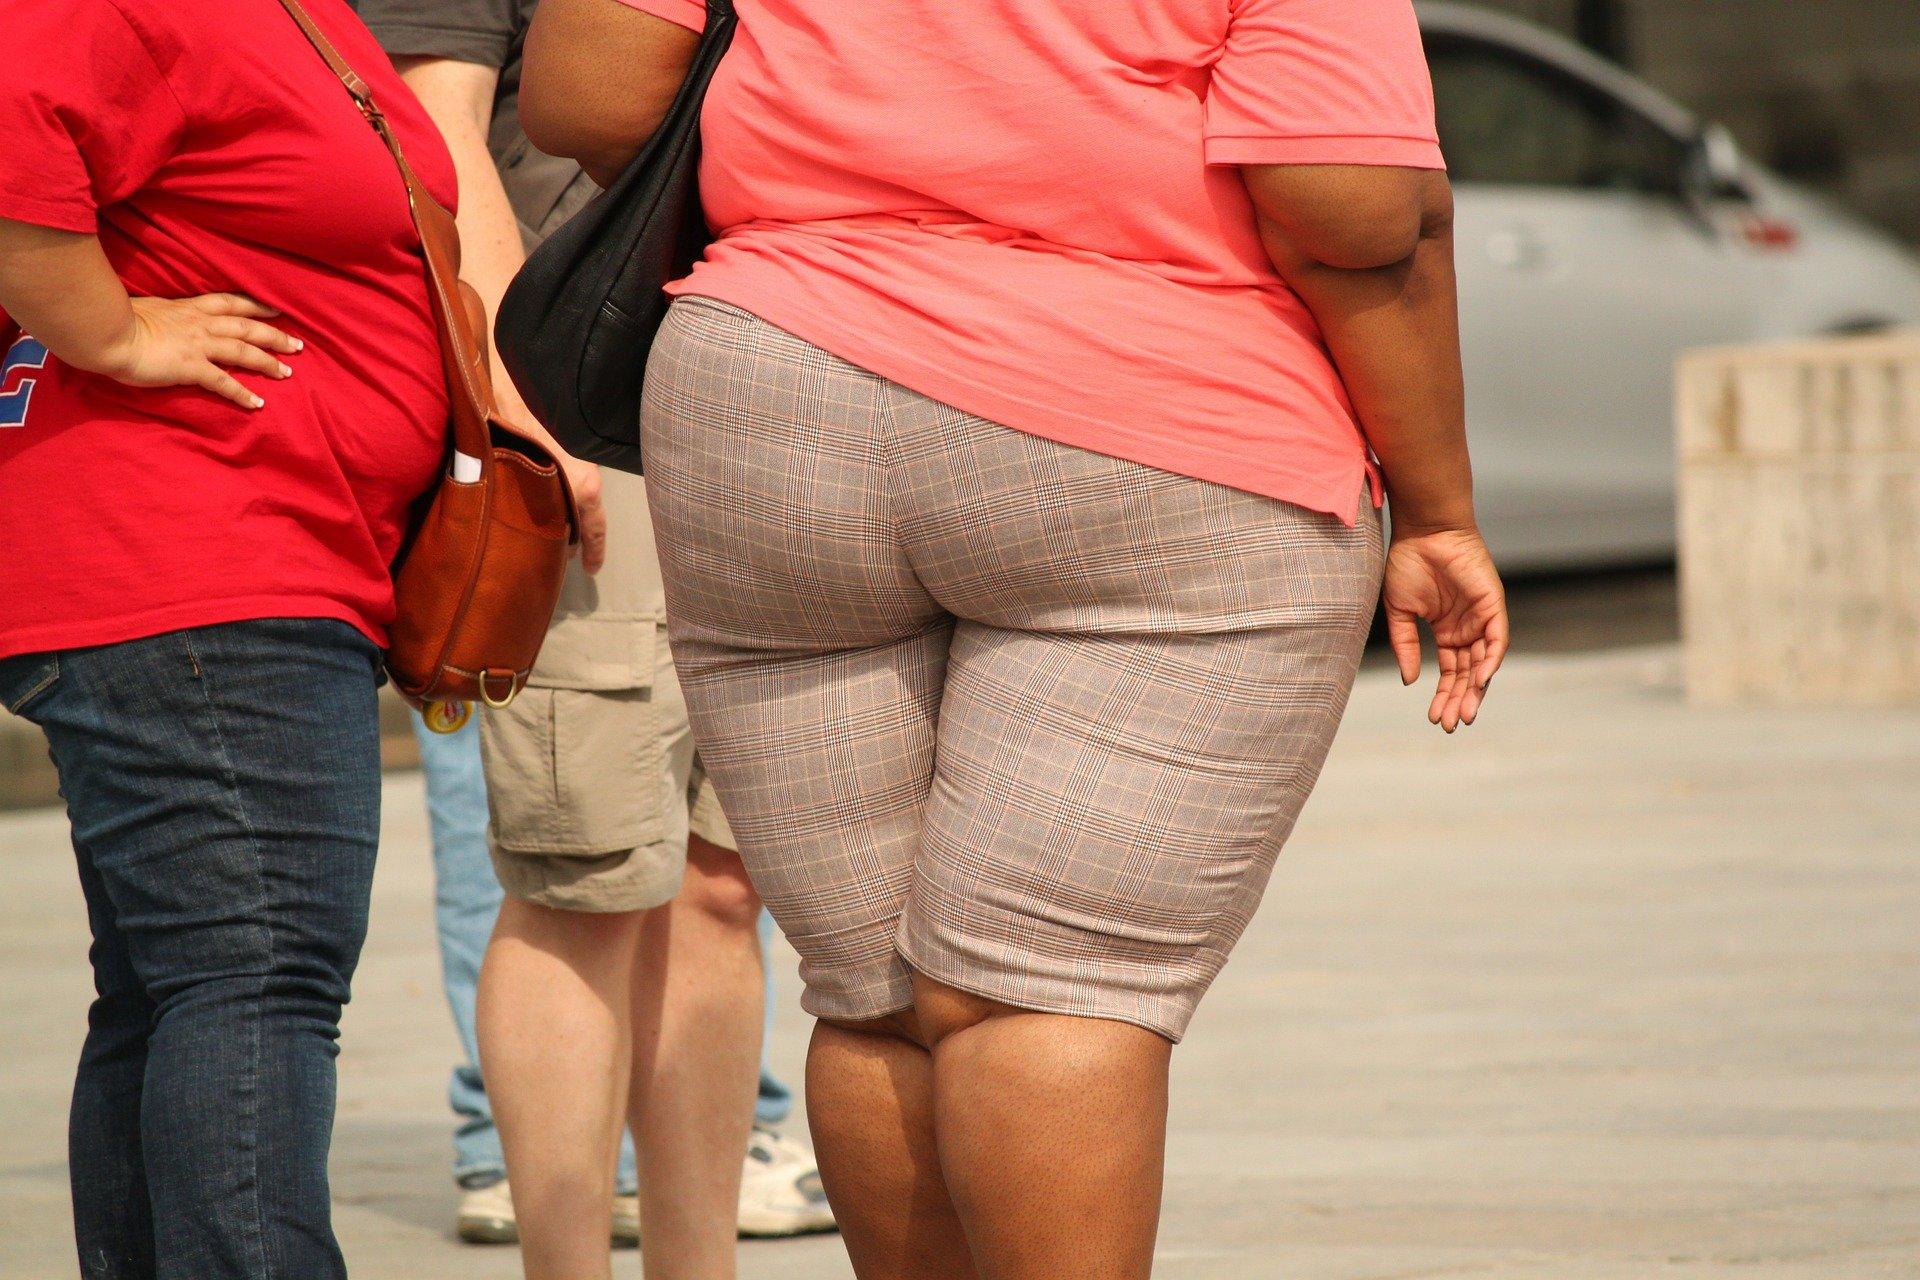 how do we overcome obesity